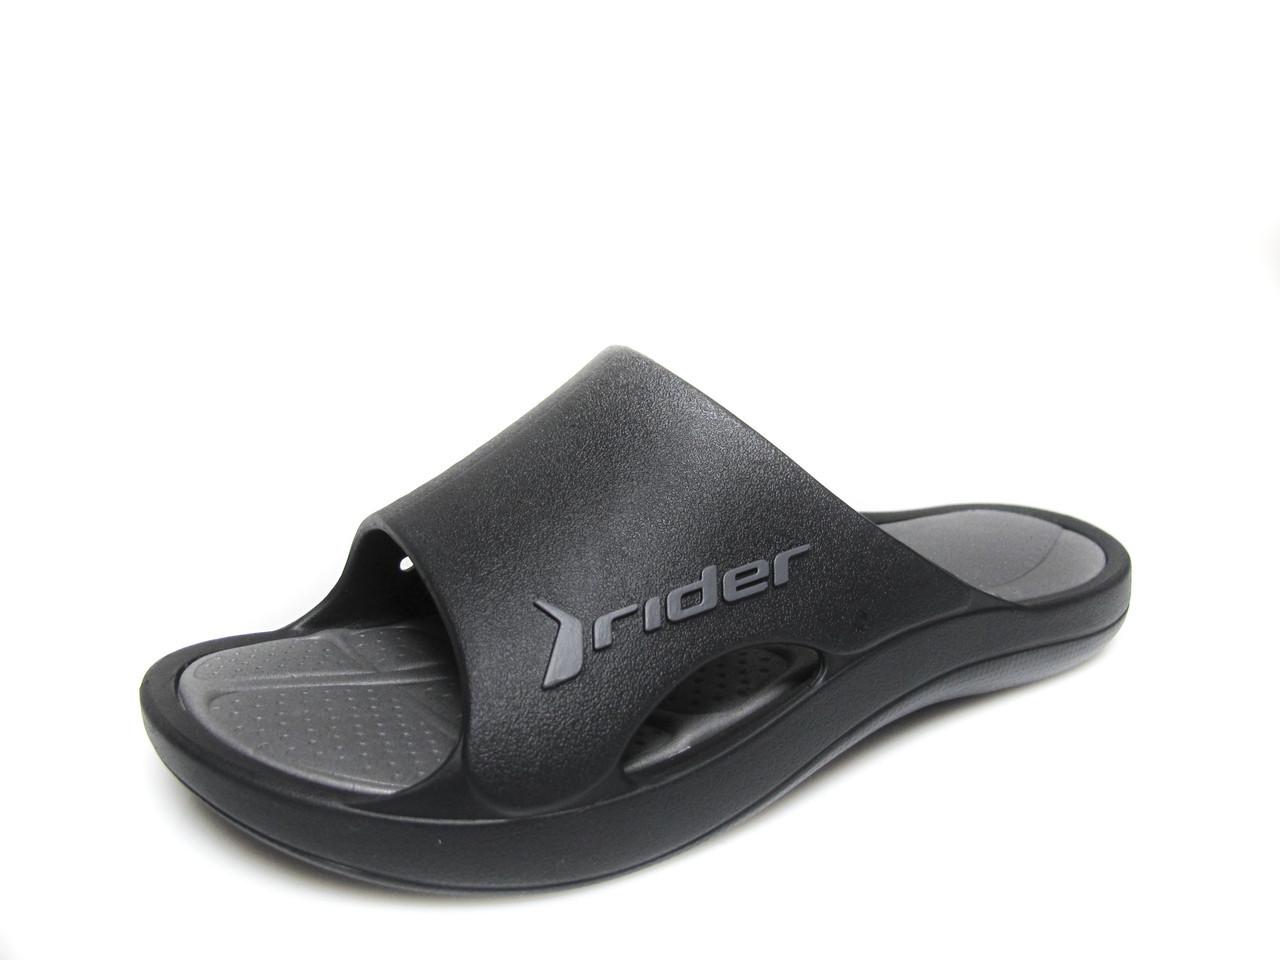 f5e01cafc Мужские шлепанцы Rider Bay III black - Интернет магазин обуви Shoes-Mania в  Днепре